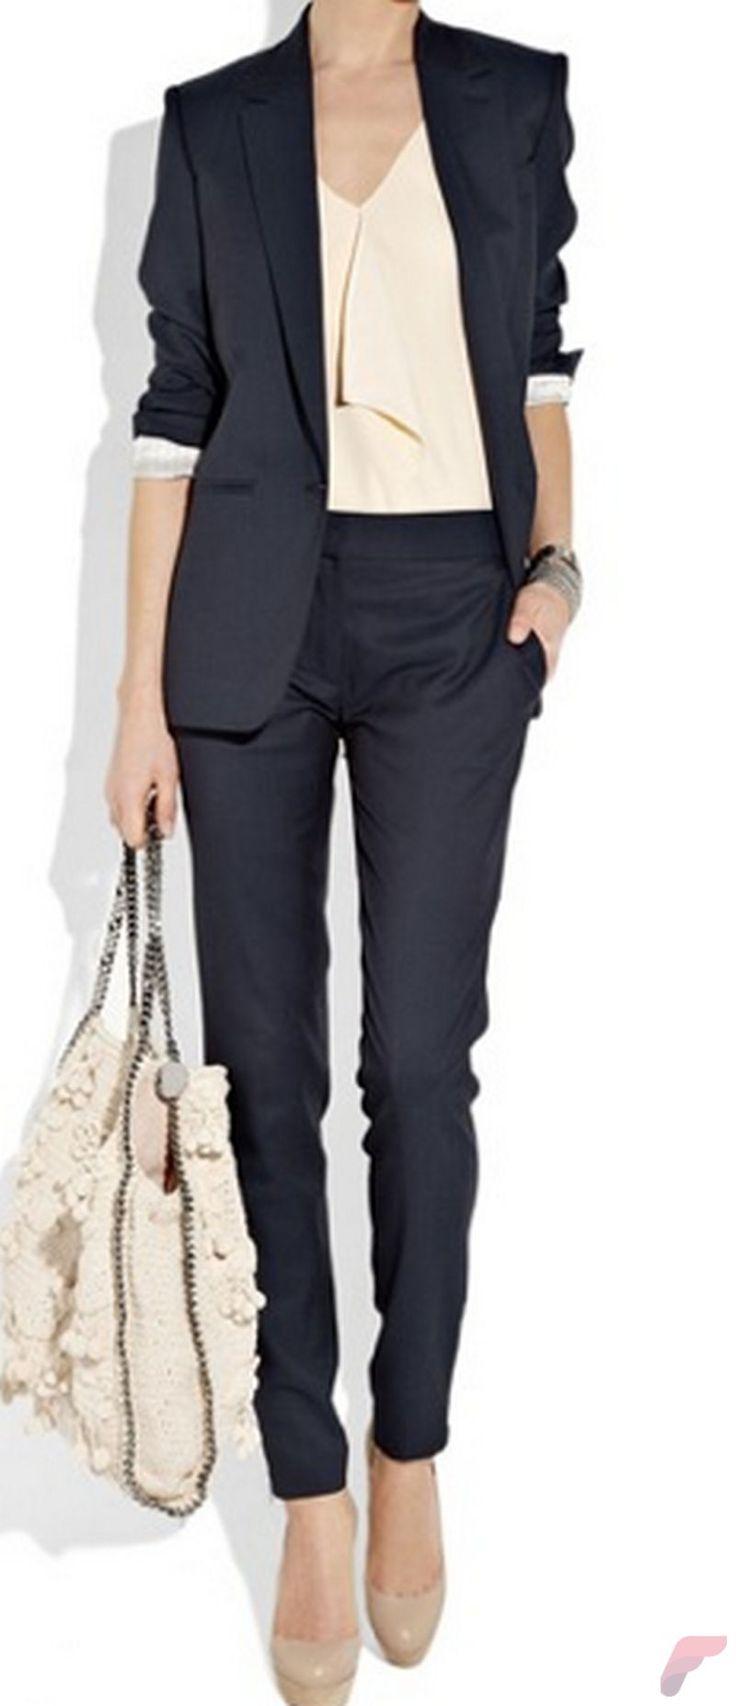 best 25 badass women fashion ideas on pinterest khaki jeans women 39 s urban chic fashion and. Black Bedroom Furniture Sets. Home Design Ideas